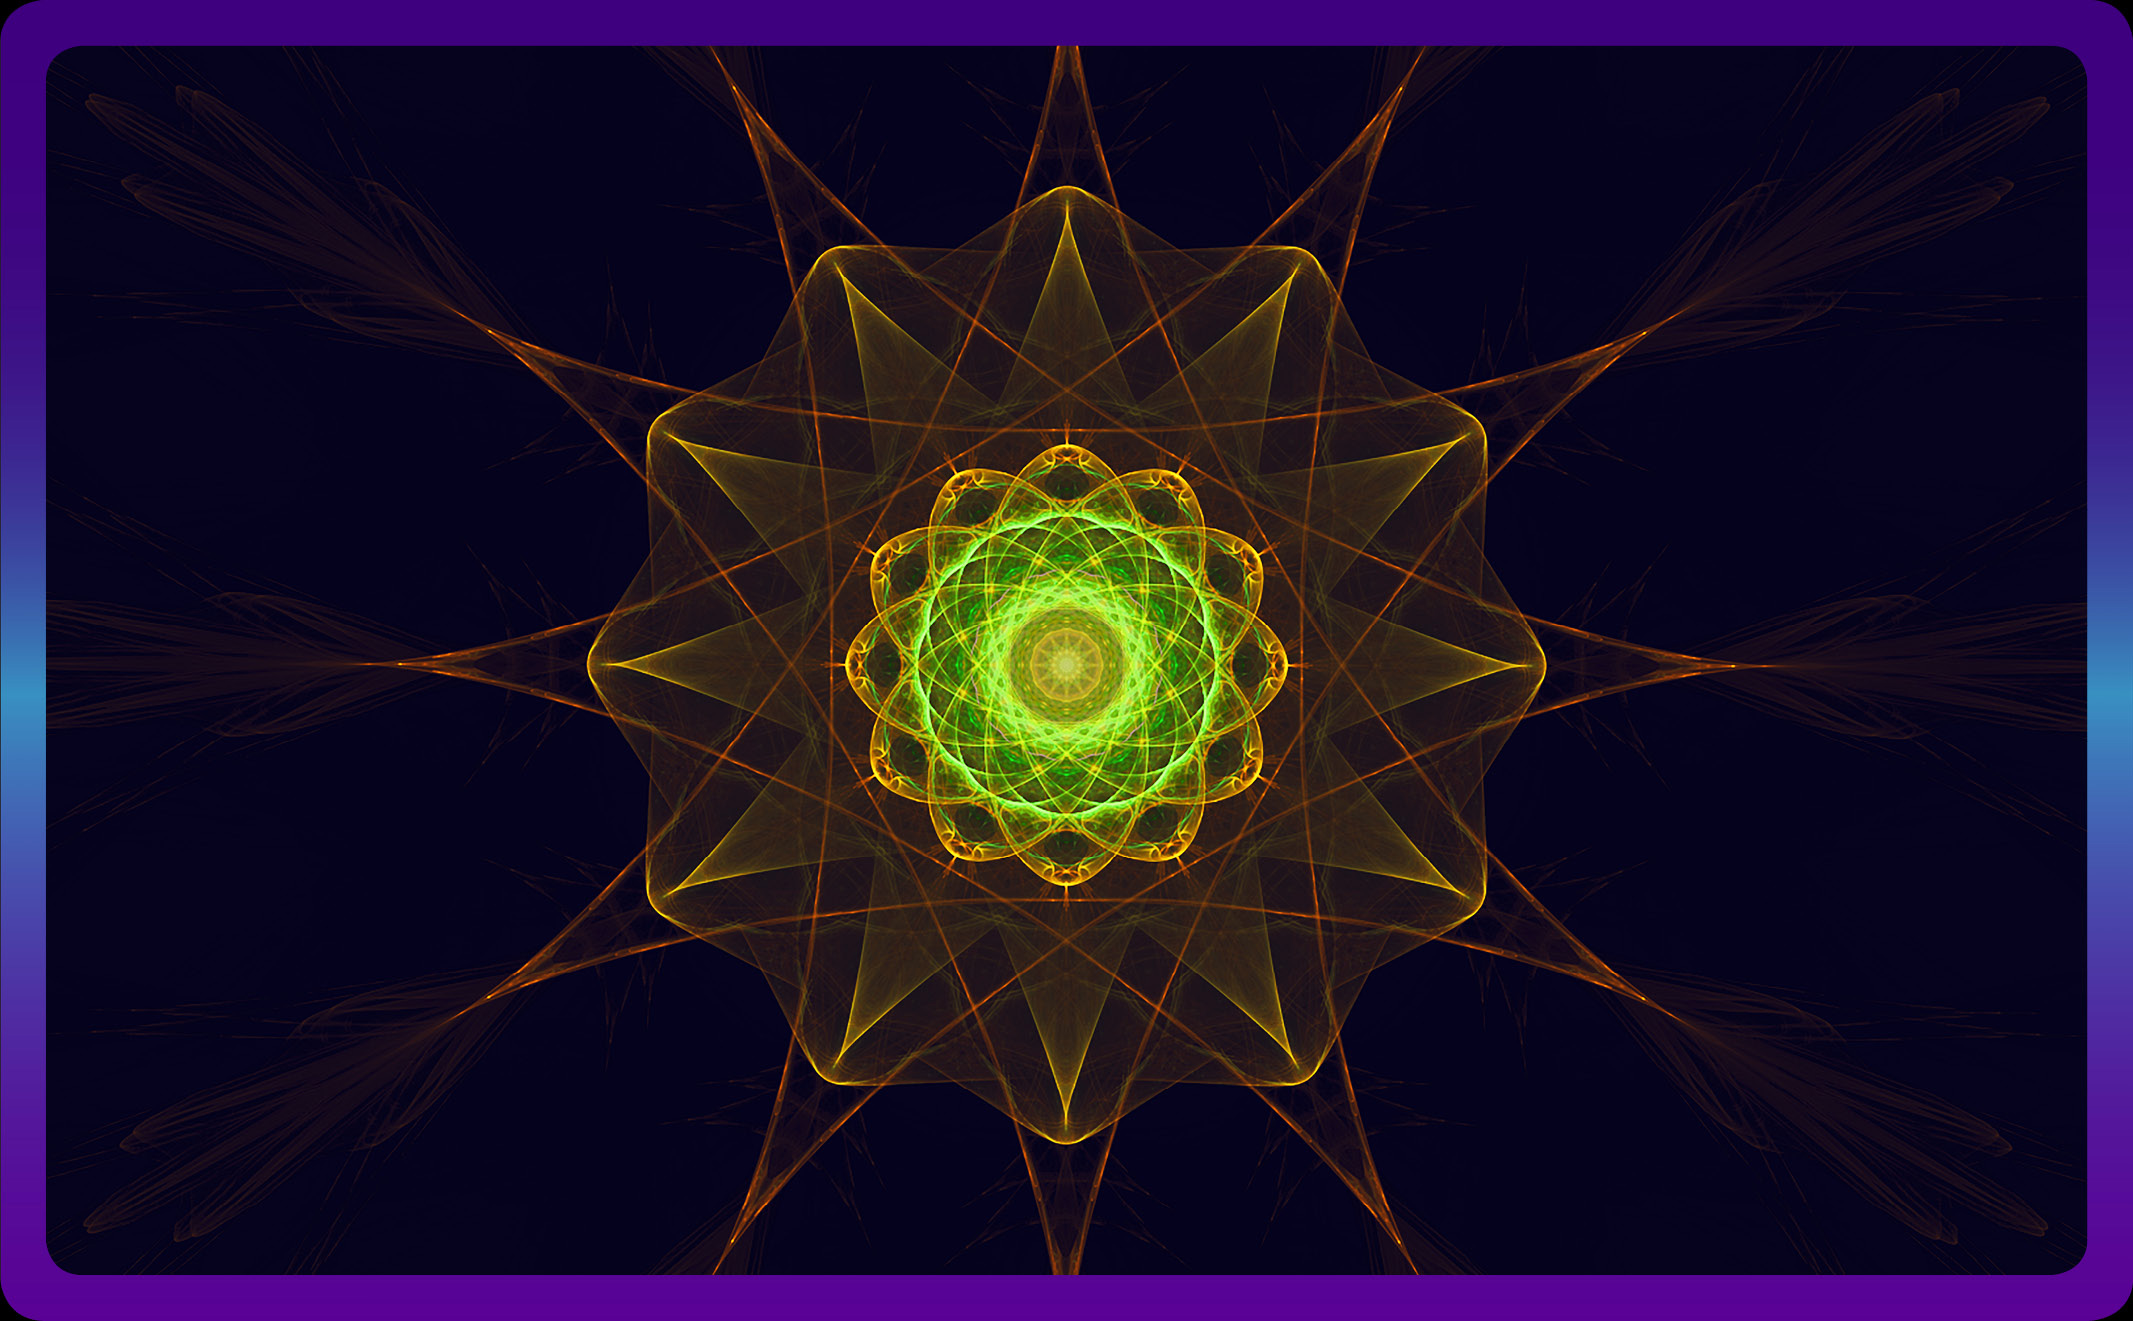 Oracle card-Tree of Life-Main Horizontal Image